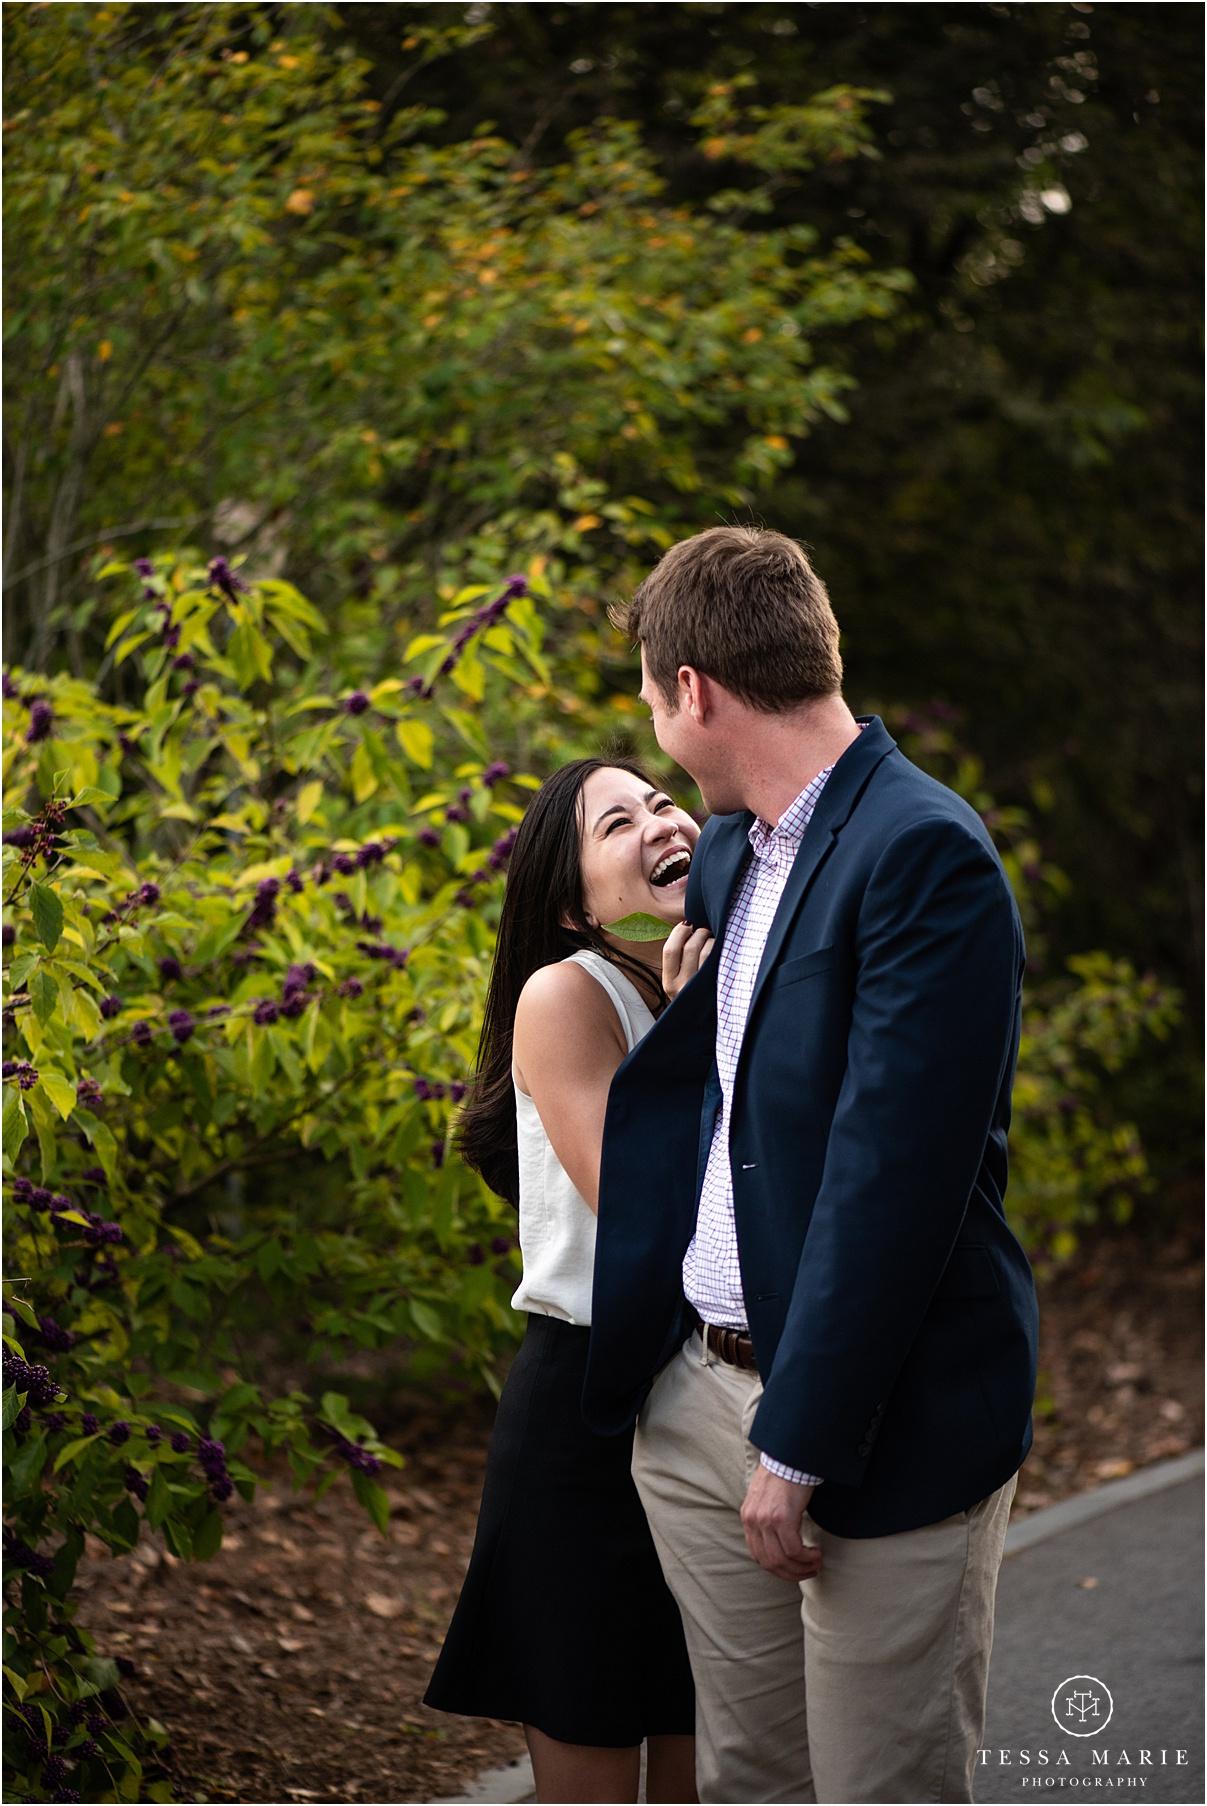 Tessa_marie_photography_wedding_photographer_engagement_pictures_piedmont_park_0067.jpg